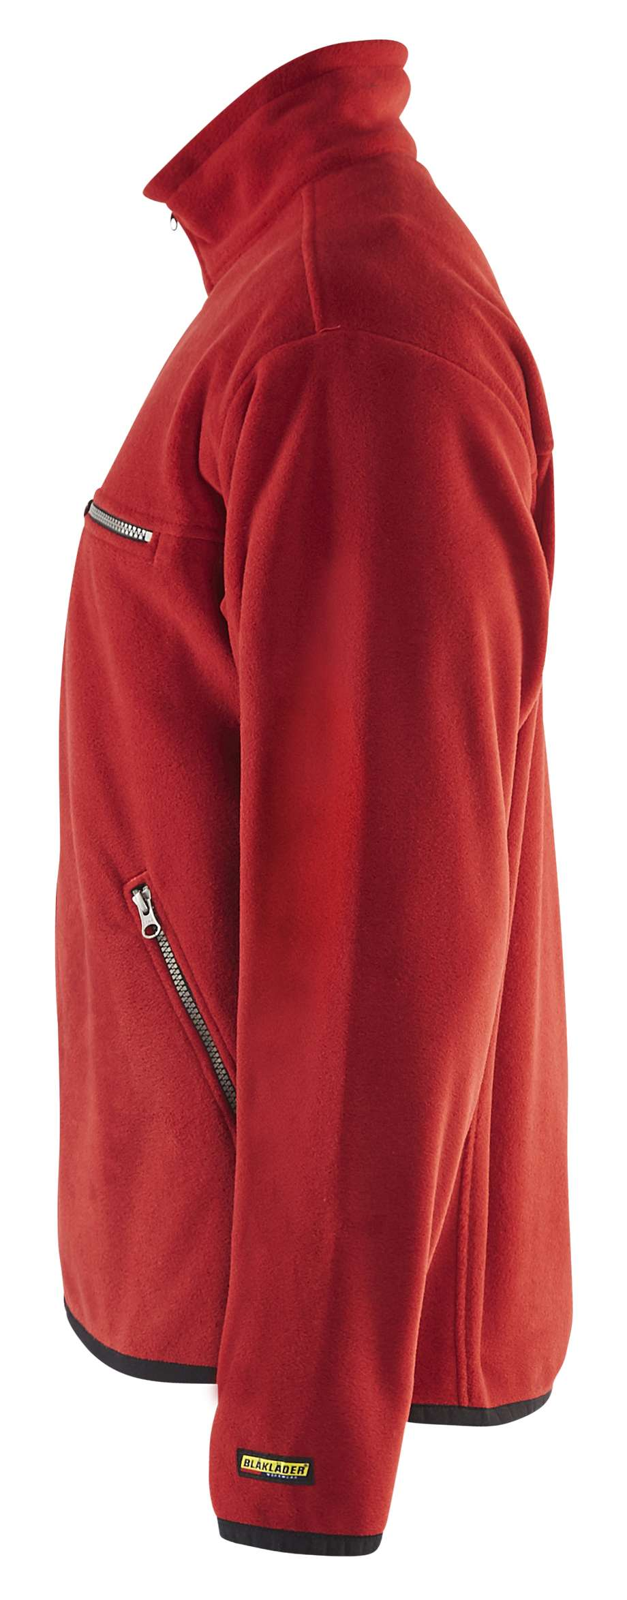 Blaklader Fleece vesten 48302510 rood(5600)